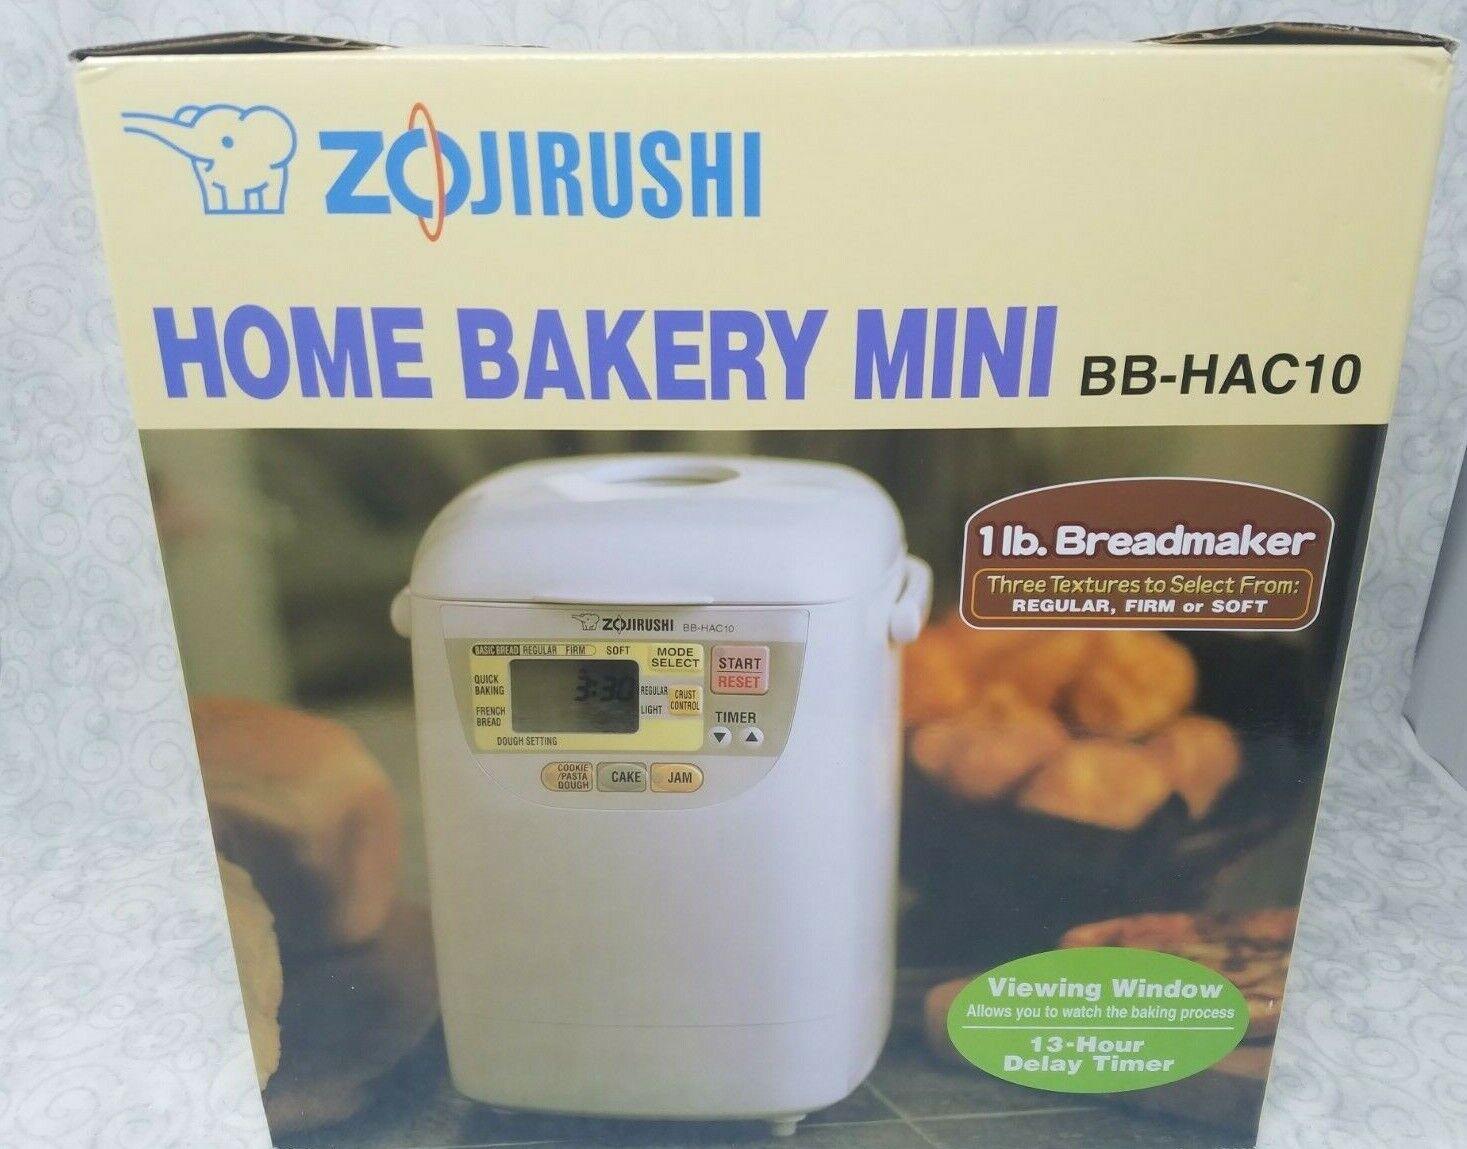 Zojirushi Home Bakery Mini Bread Maker BB-HAC10, White - Bra